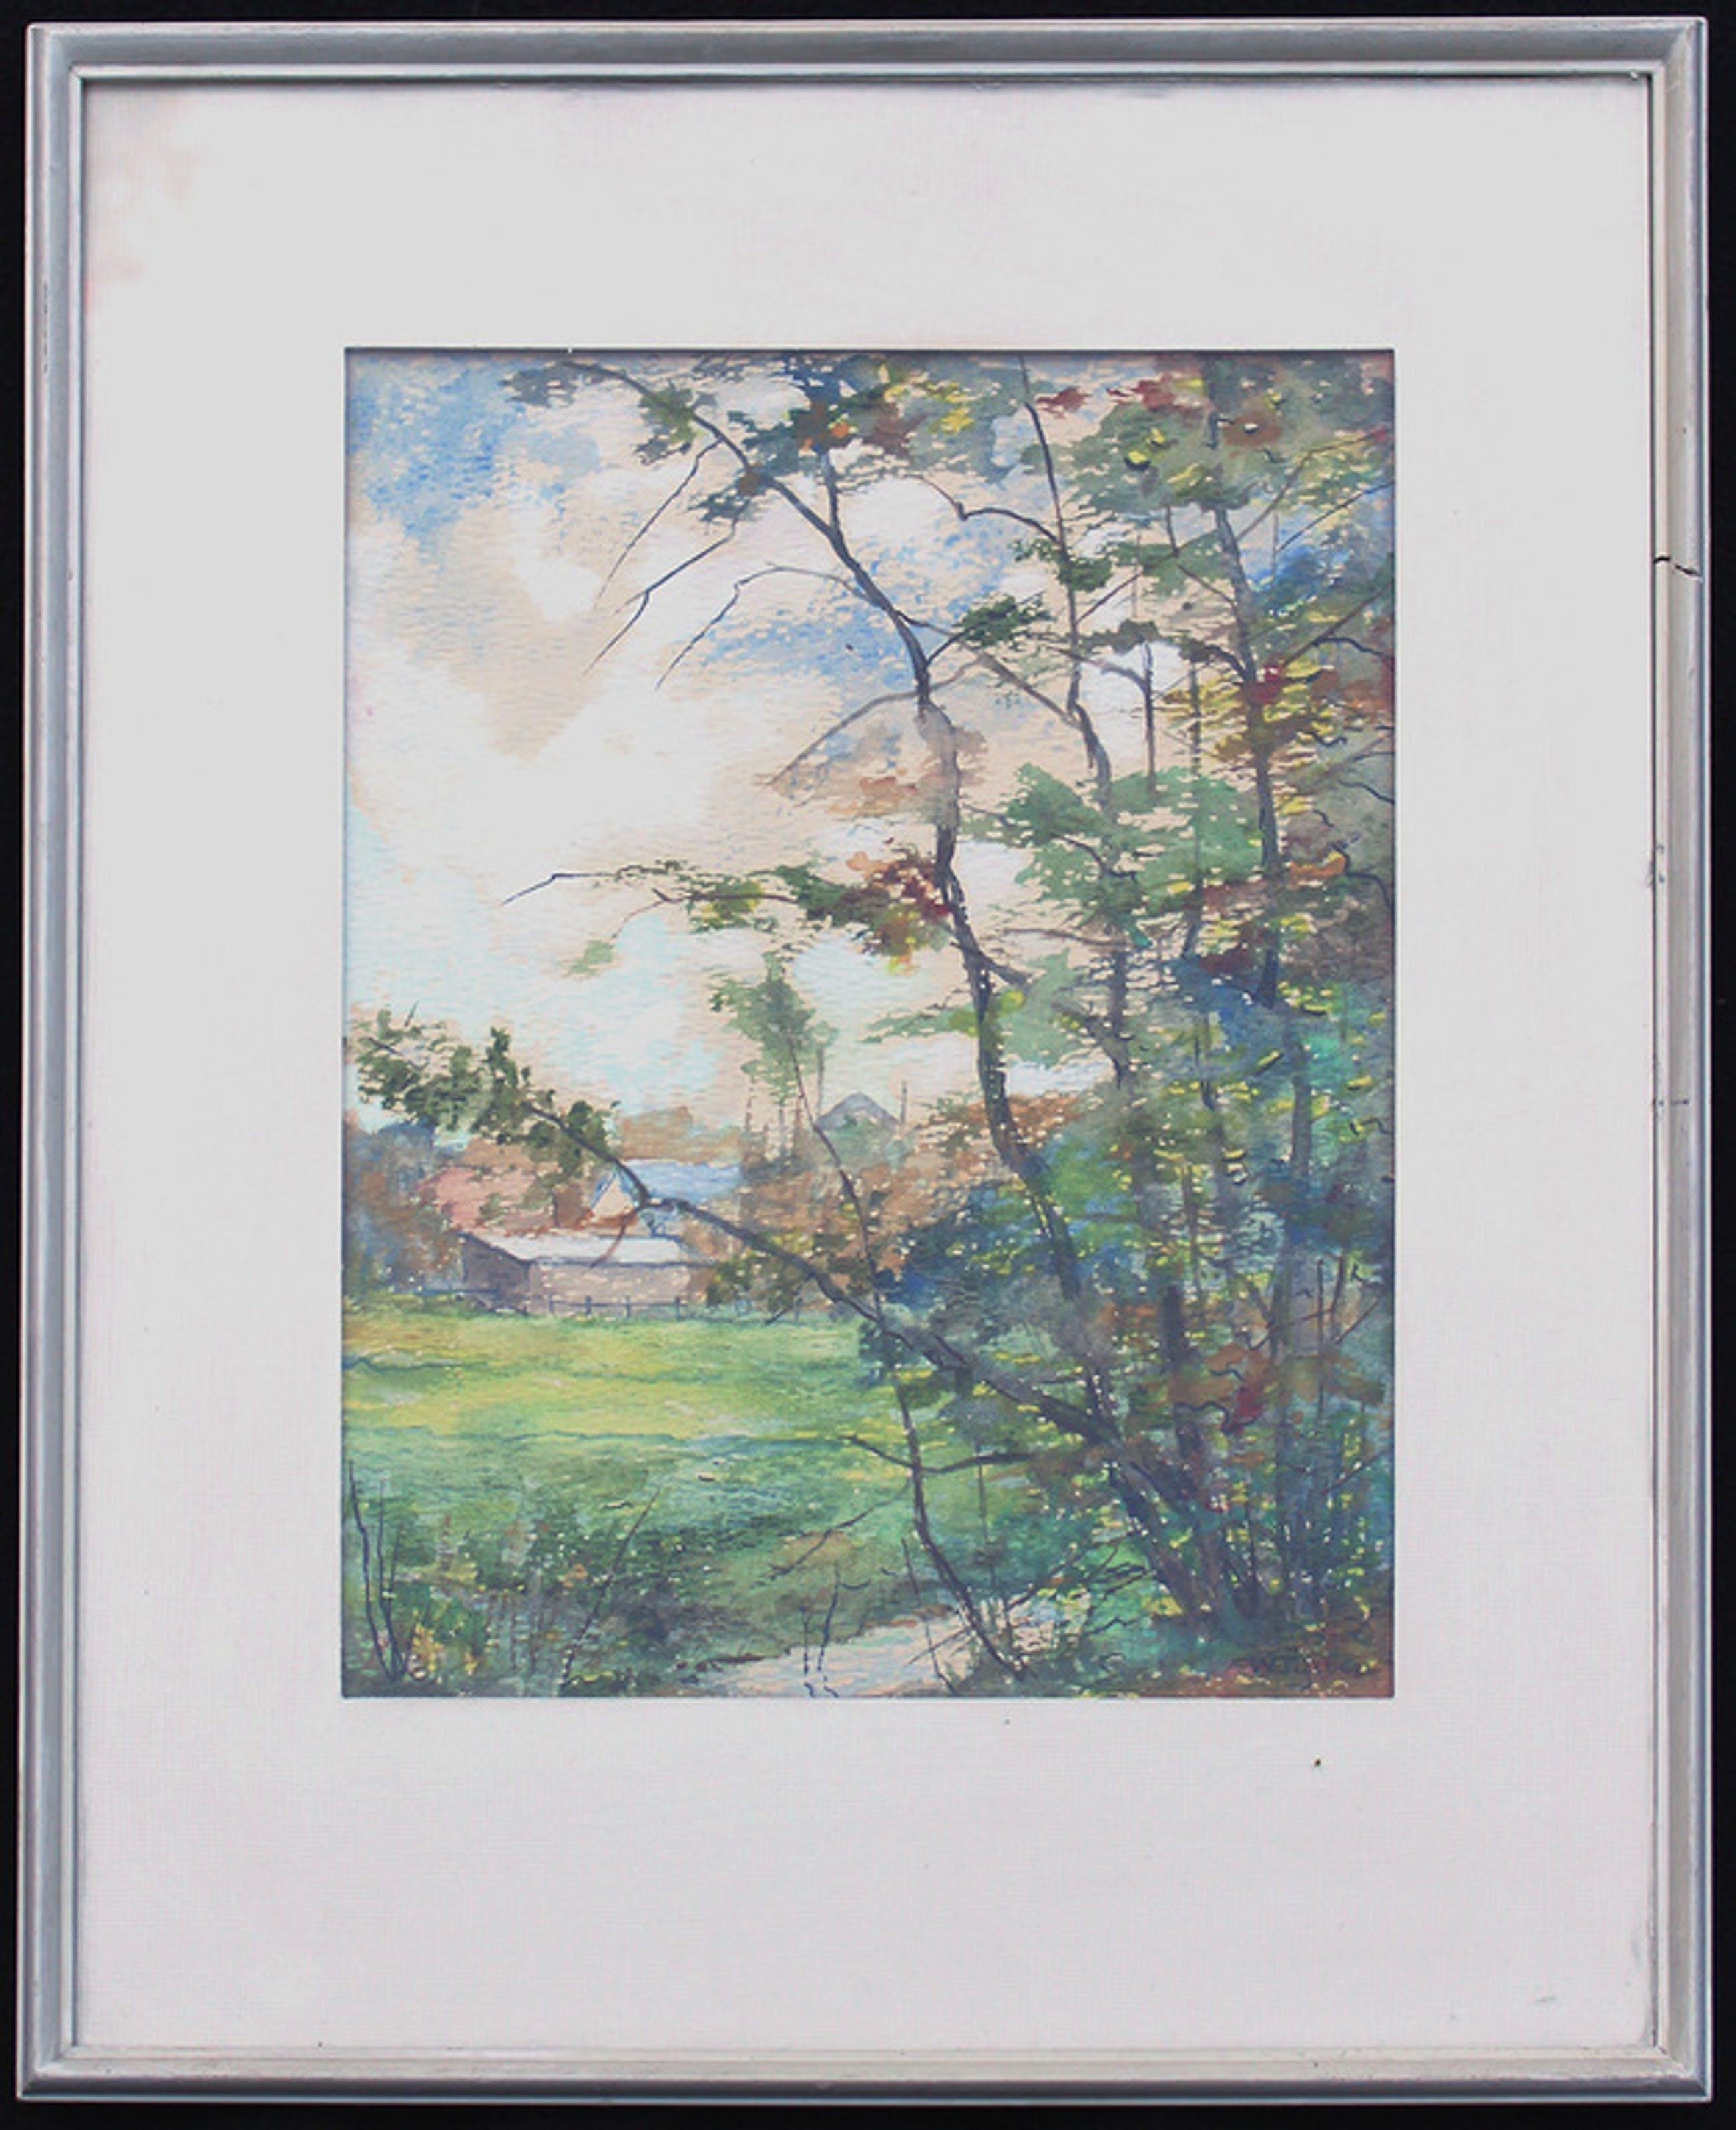 WILLEM TIJSSEN: aquarel/plakkatverf, zonder titel  kopen? Bied vanaf 65!